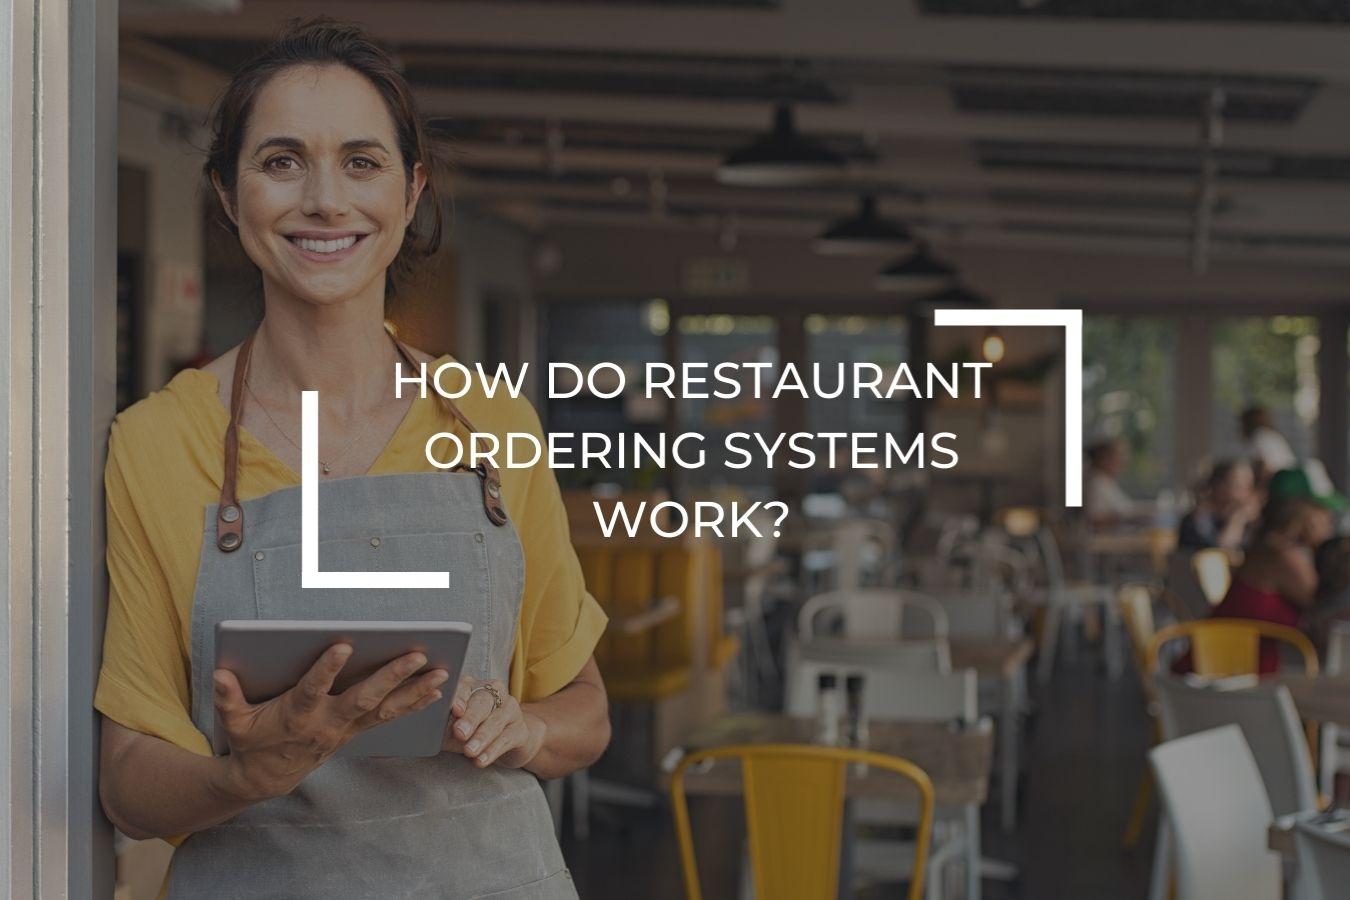 How do restaurant ordering systems work